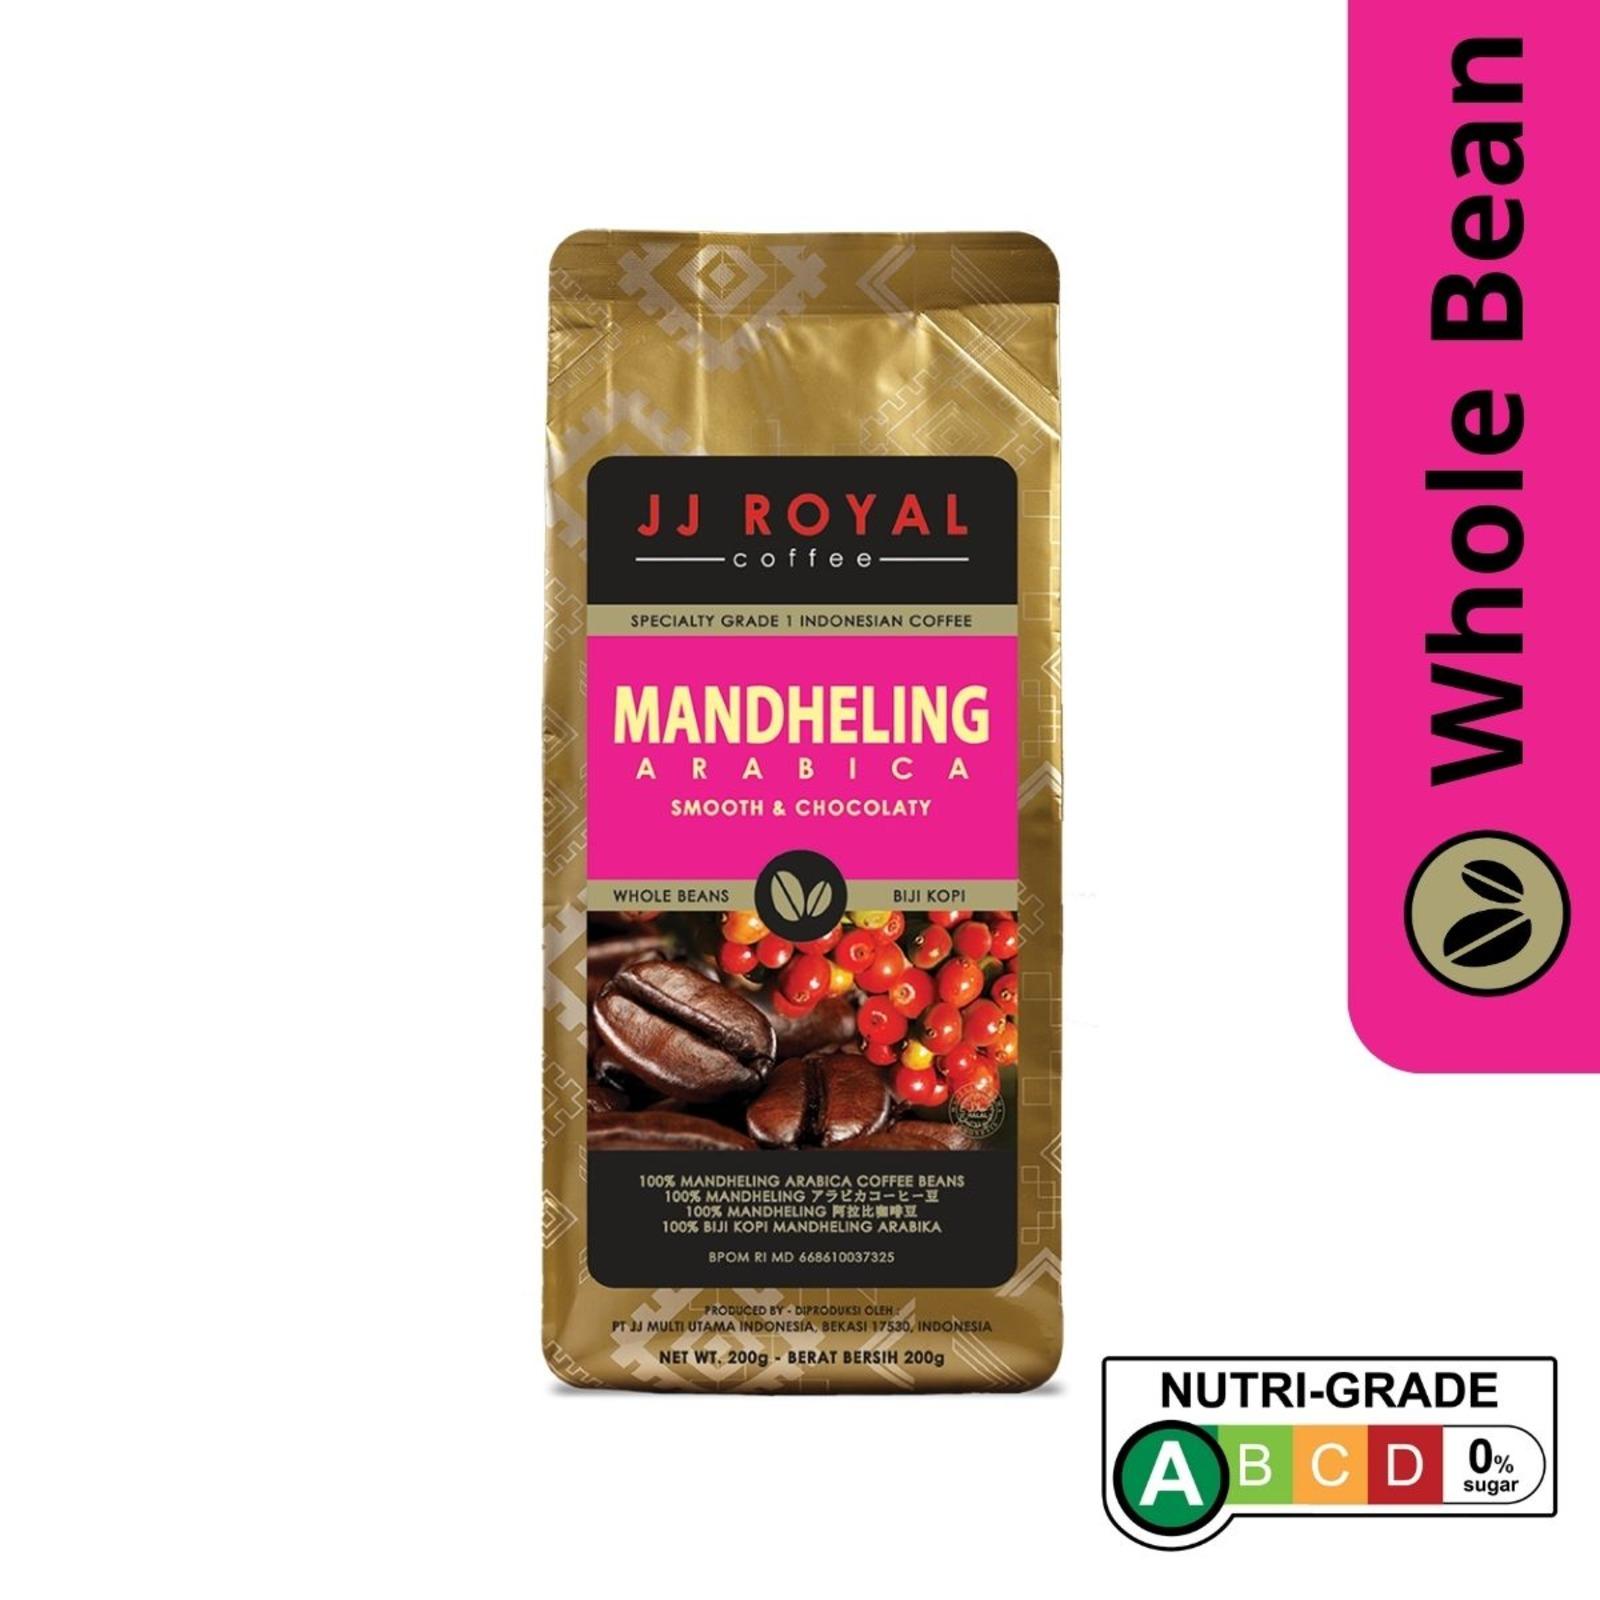 JJ Royal Coffee - Mandheling 100% Arabica (Whole Bean)